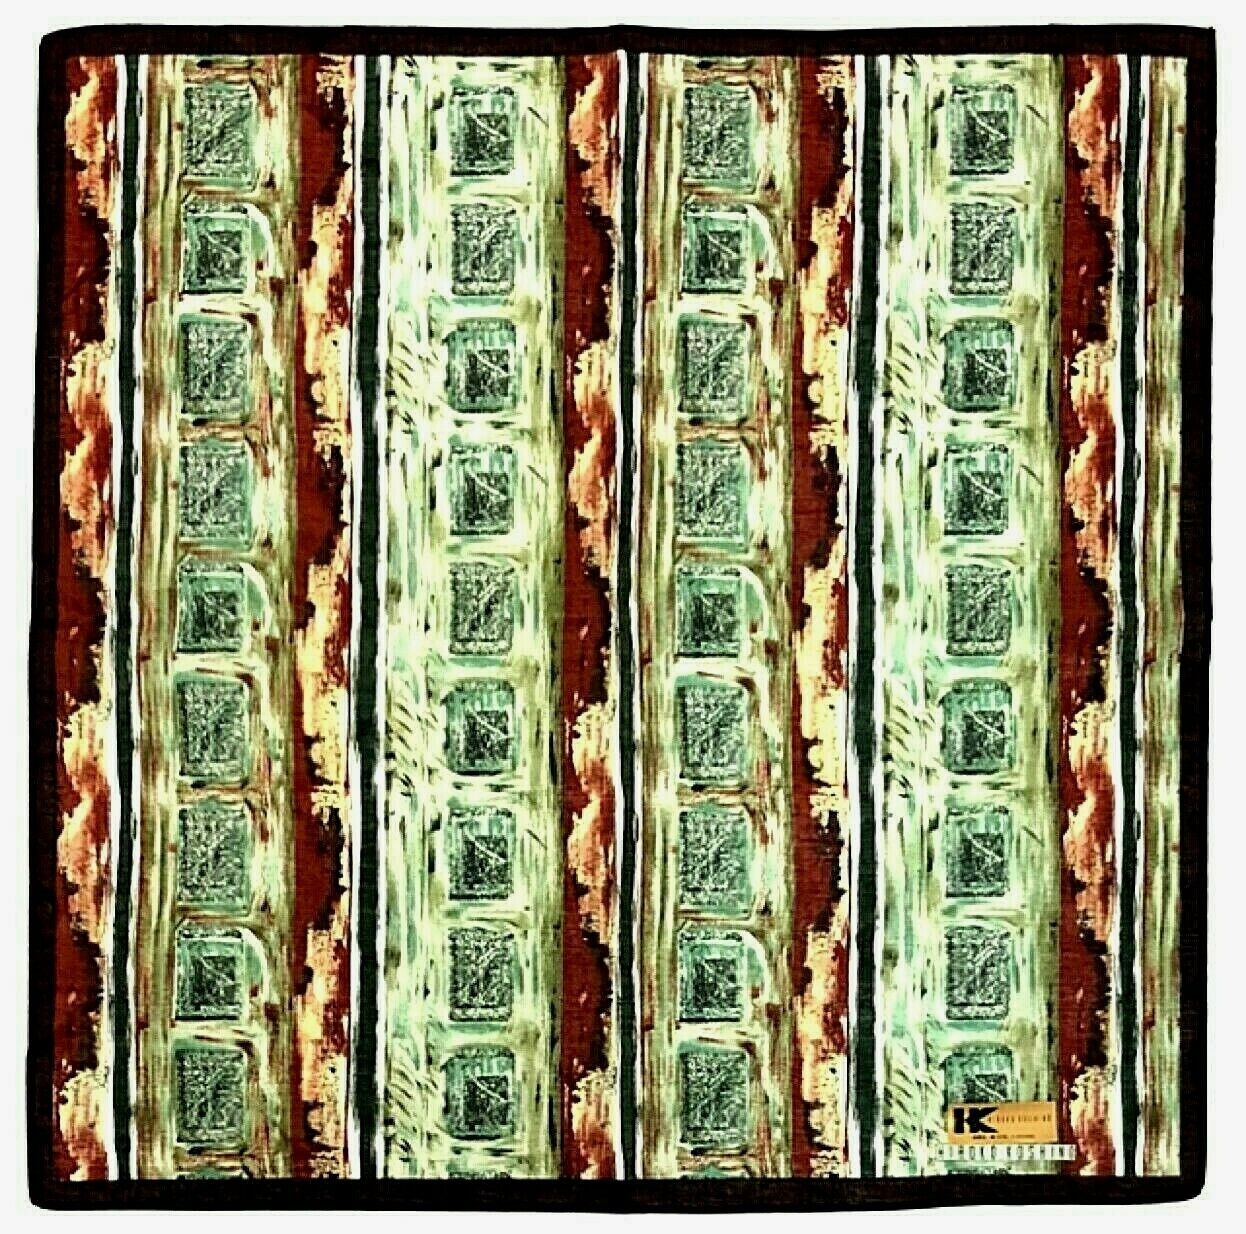 Hanky HIROKO KOSHINO stripes and blocks pattern handkerchief Green